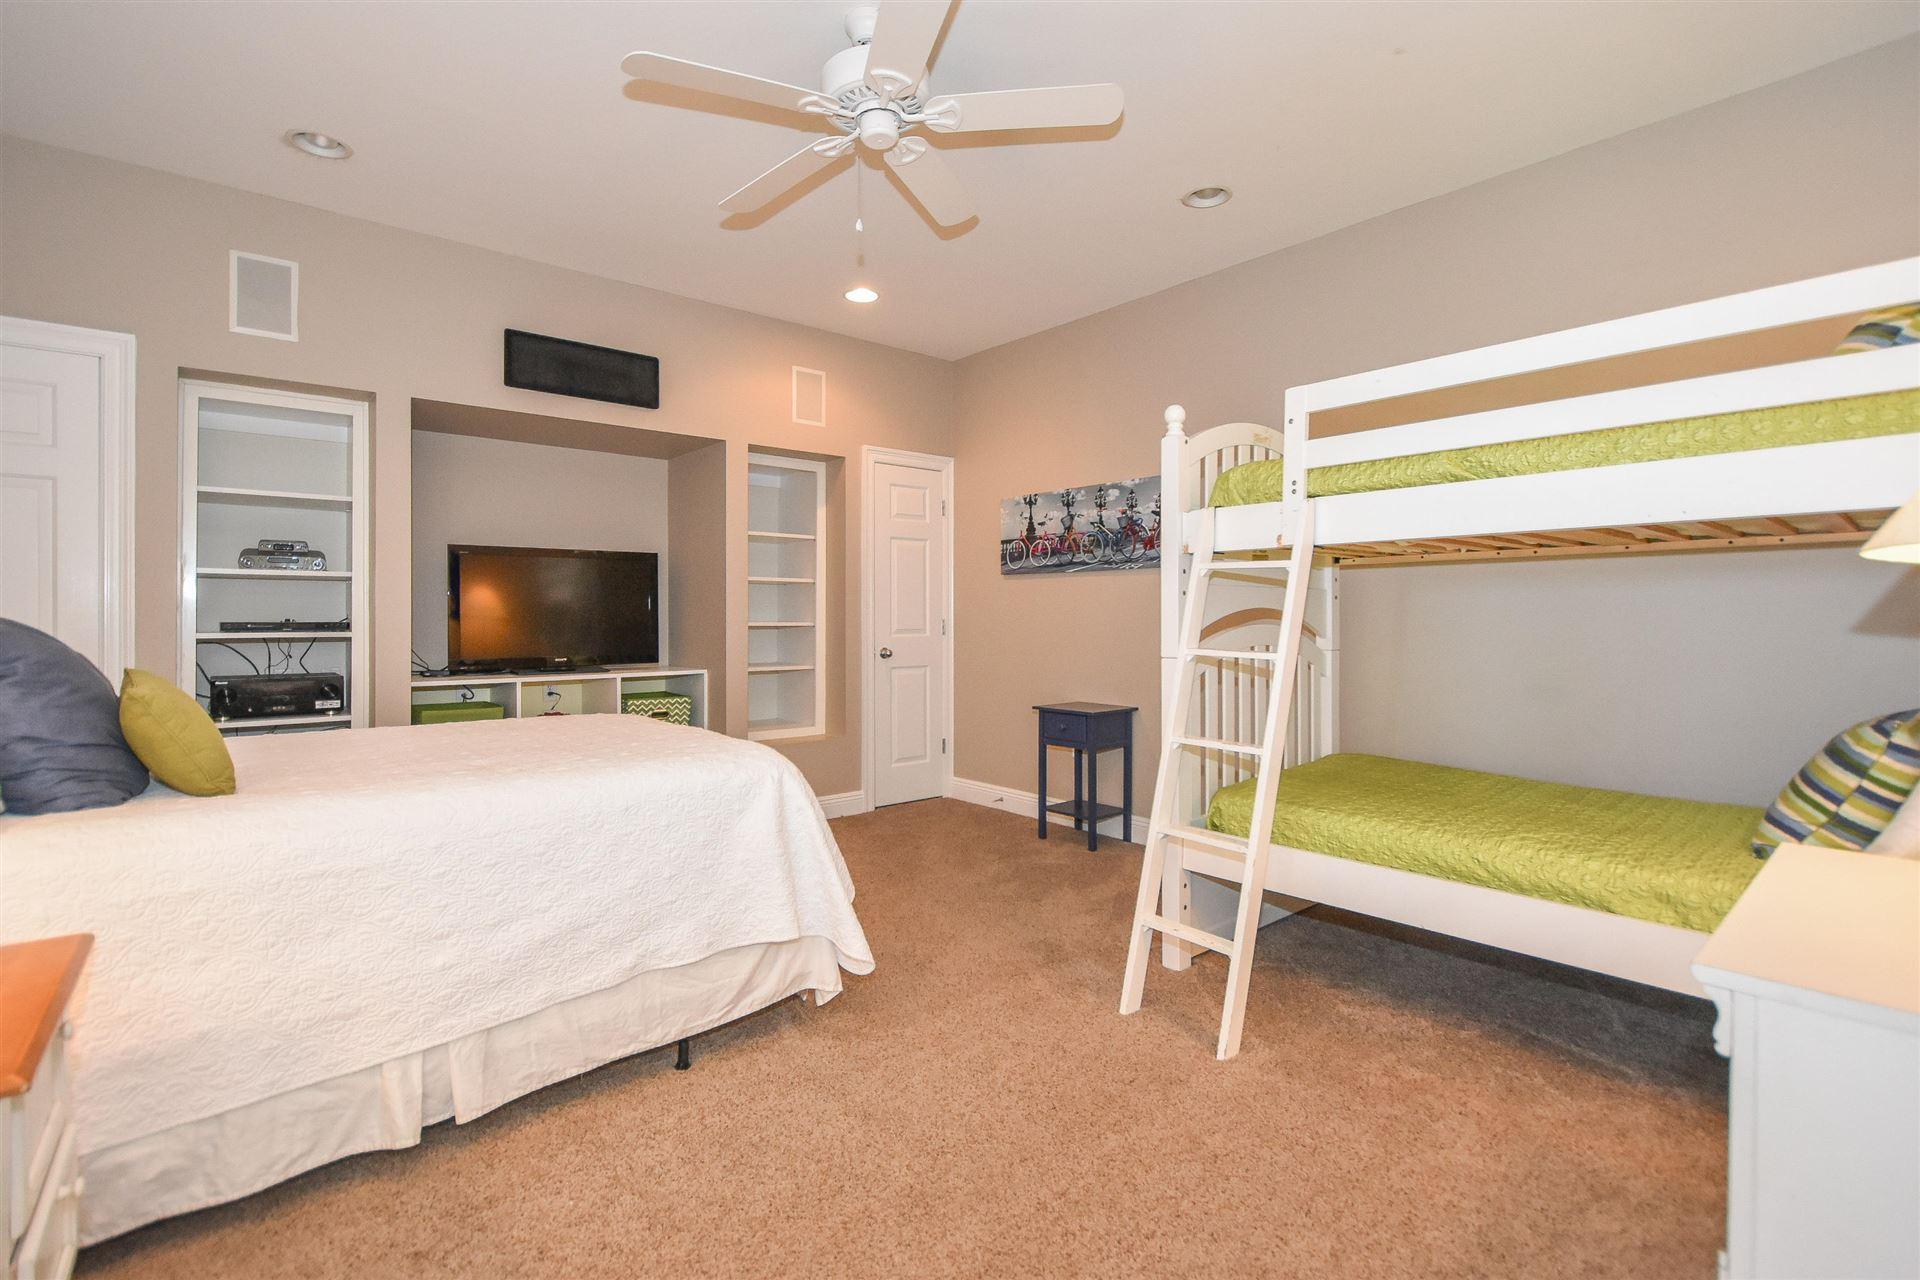 60 Ballamore Road Miramar Beach Fl Mls 806171 6 Bed